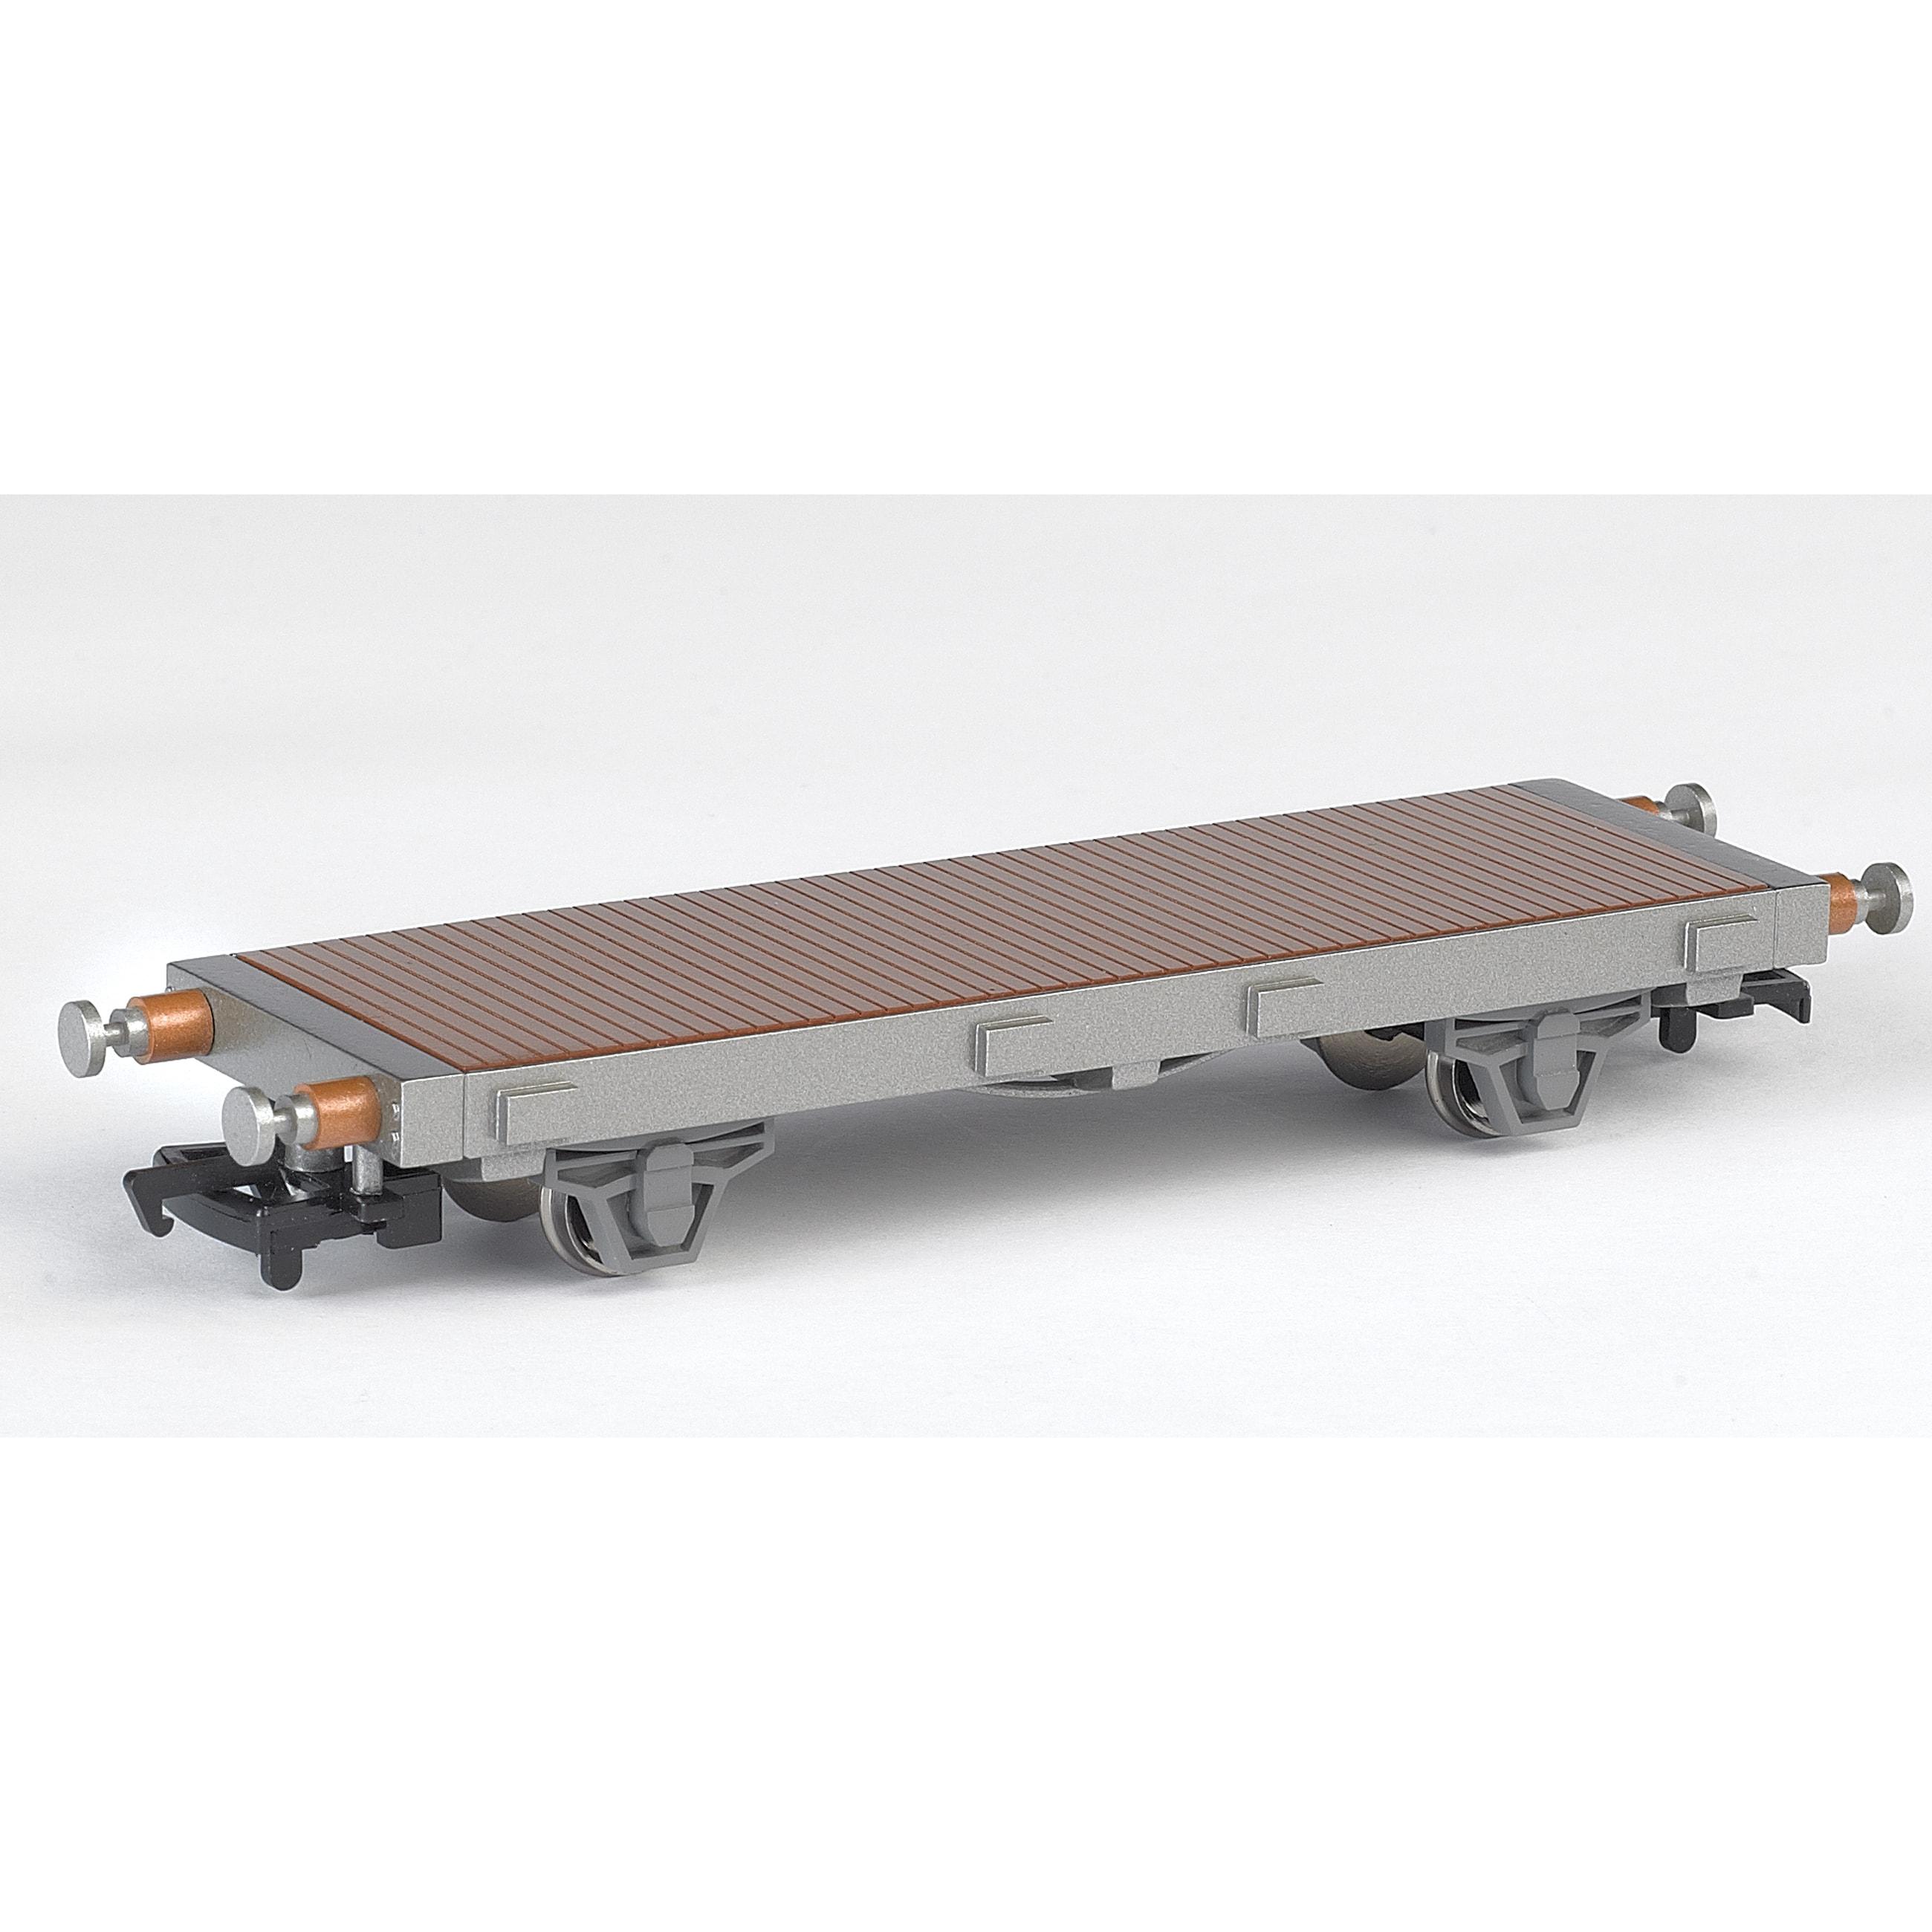 Bachmann Trains Chuggington Flat Car- HO Scale Train (G02...